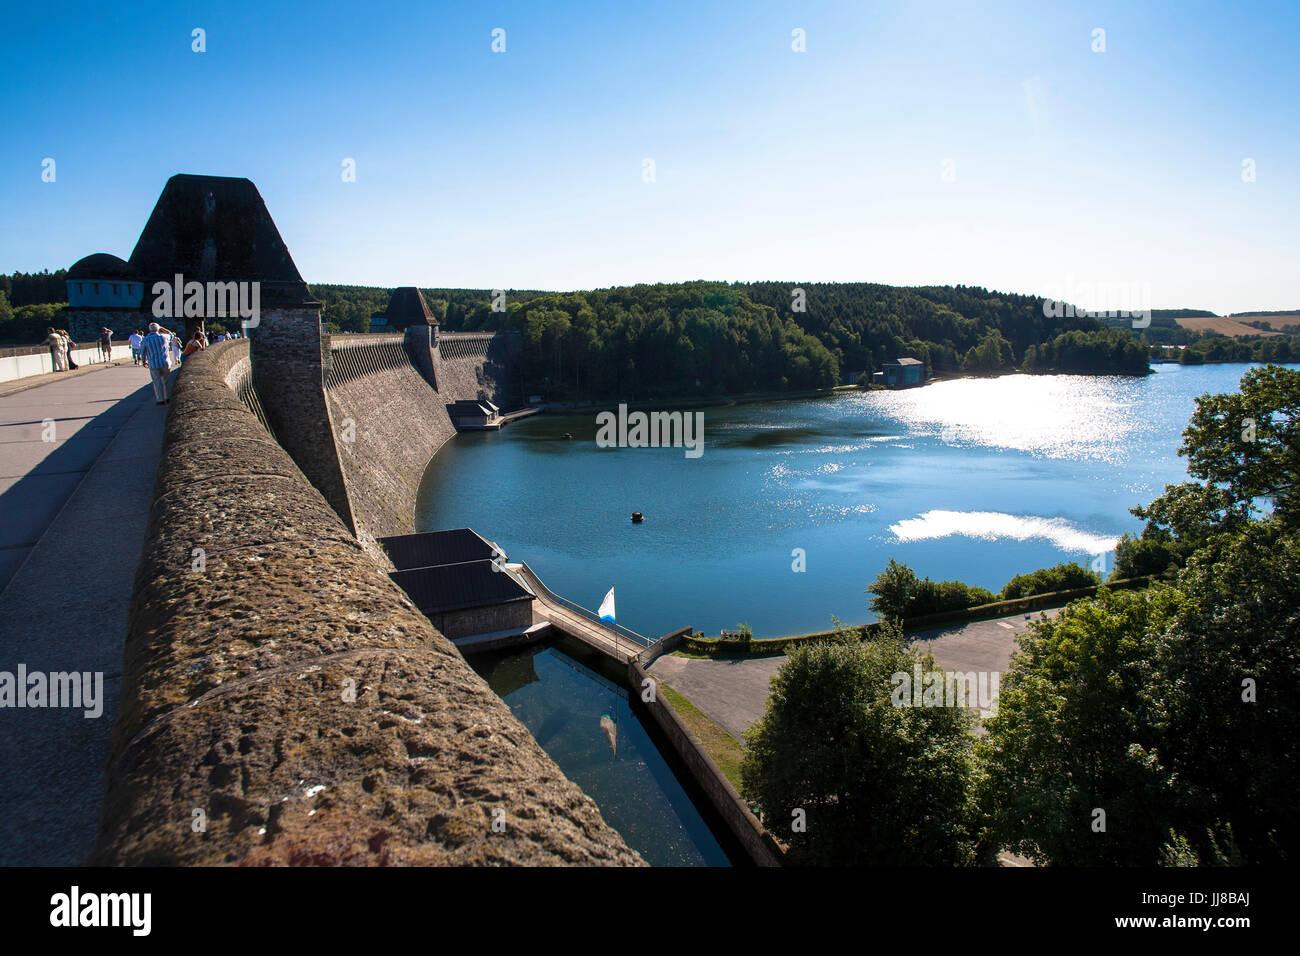 DEU, Germany, Sauerland region, Moehnesee, Moehnesee water supply dam.  DEU, Deutschland, Sauerland, Moehnesee, Stock Photo